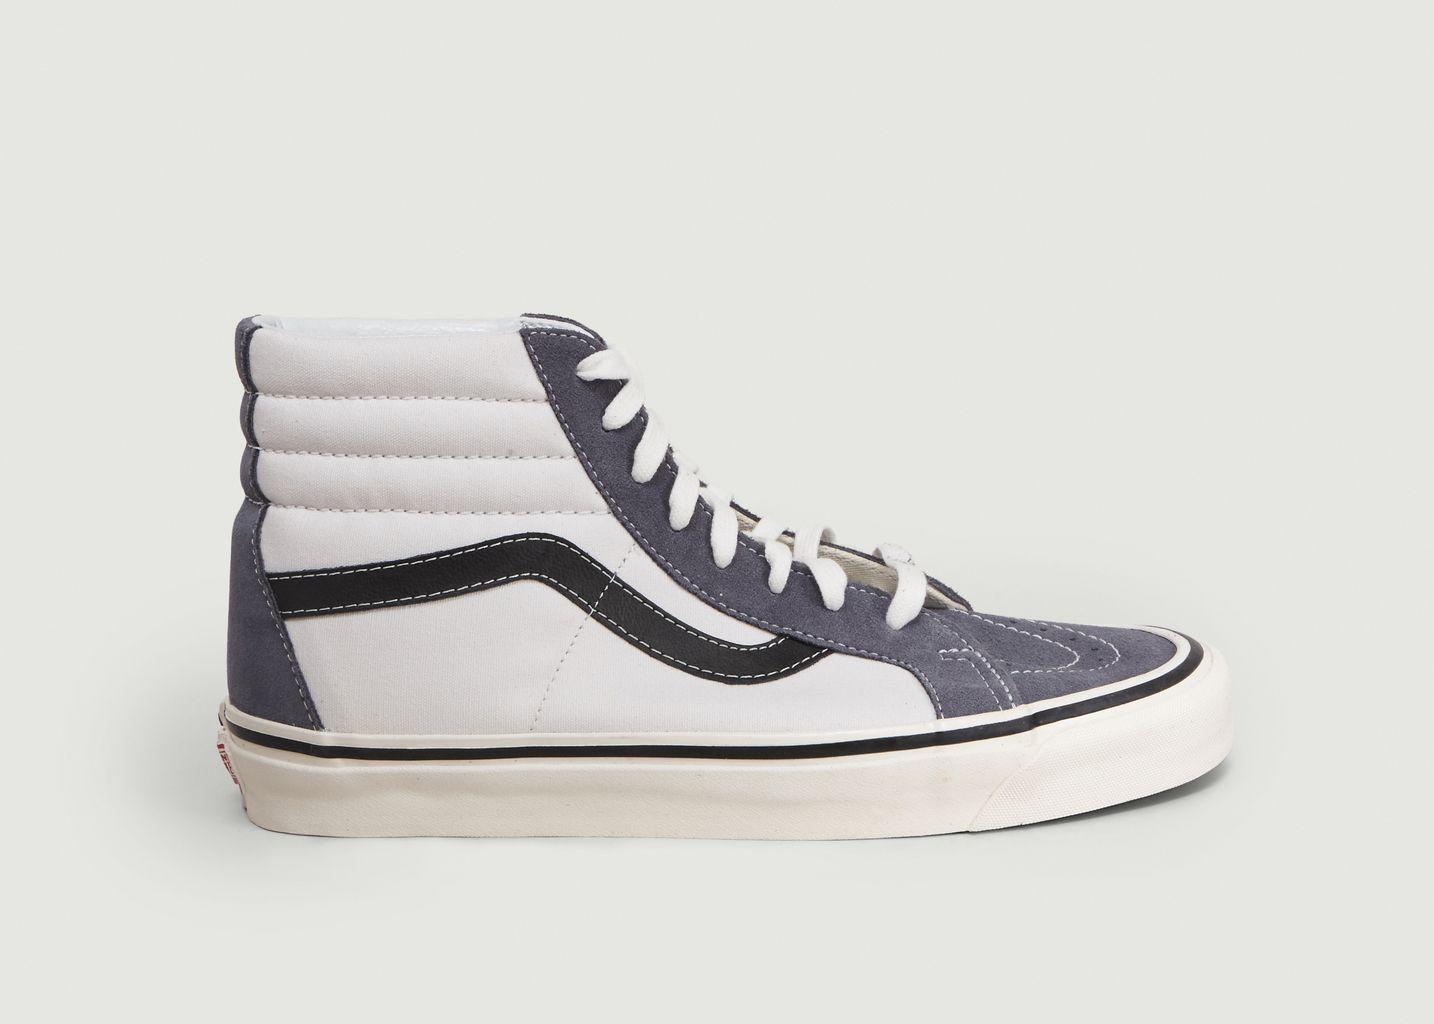 Sneakers Montantes Anaheim Factory SK8 HI 38